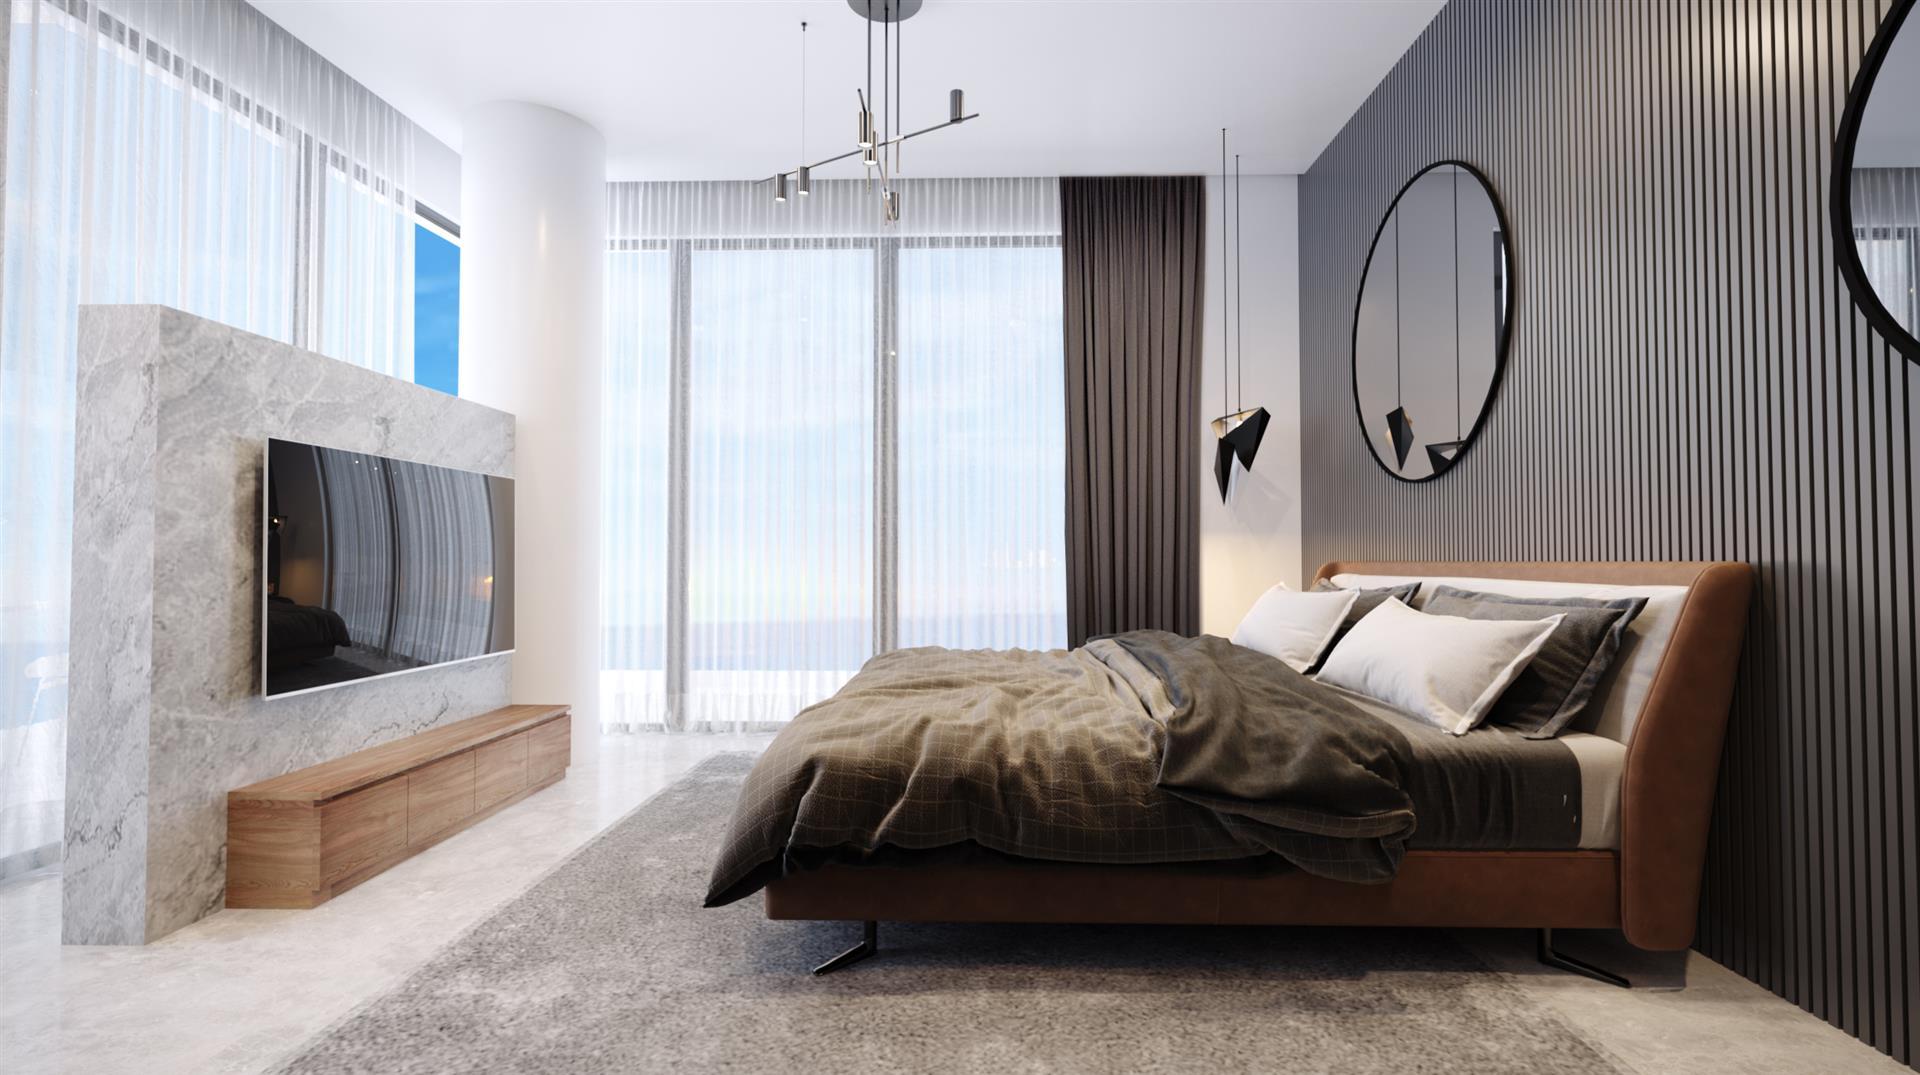 Luxury 2 bedroom resort-style loft apartment